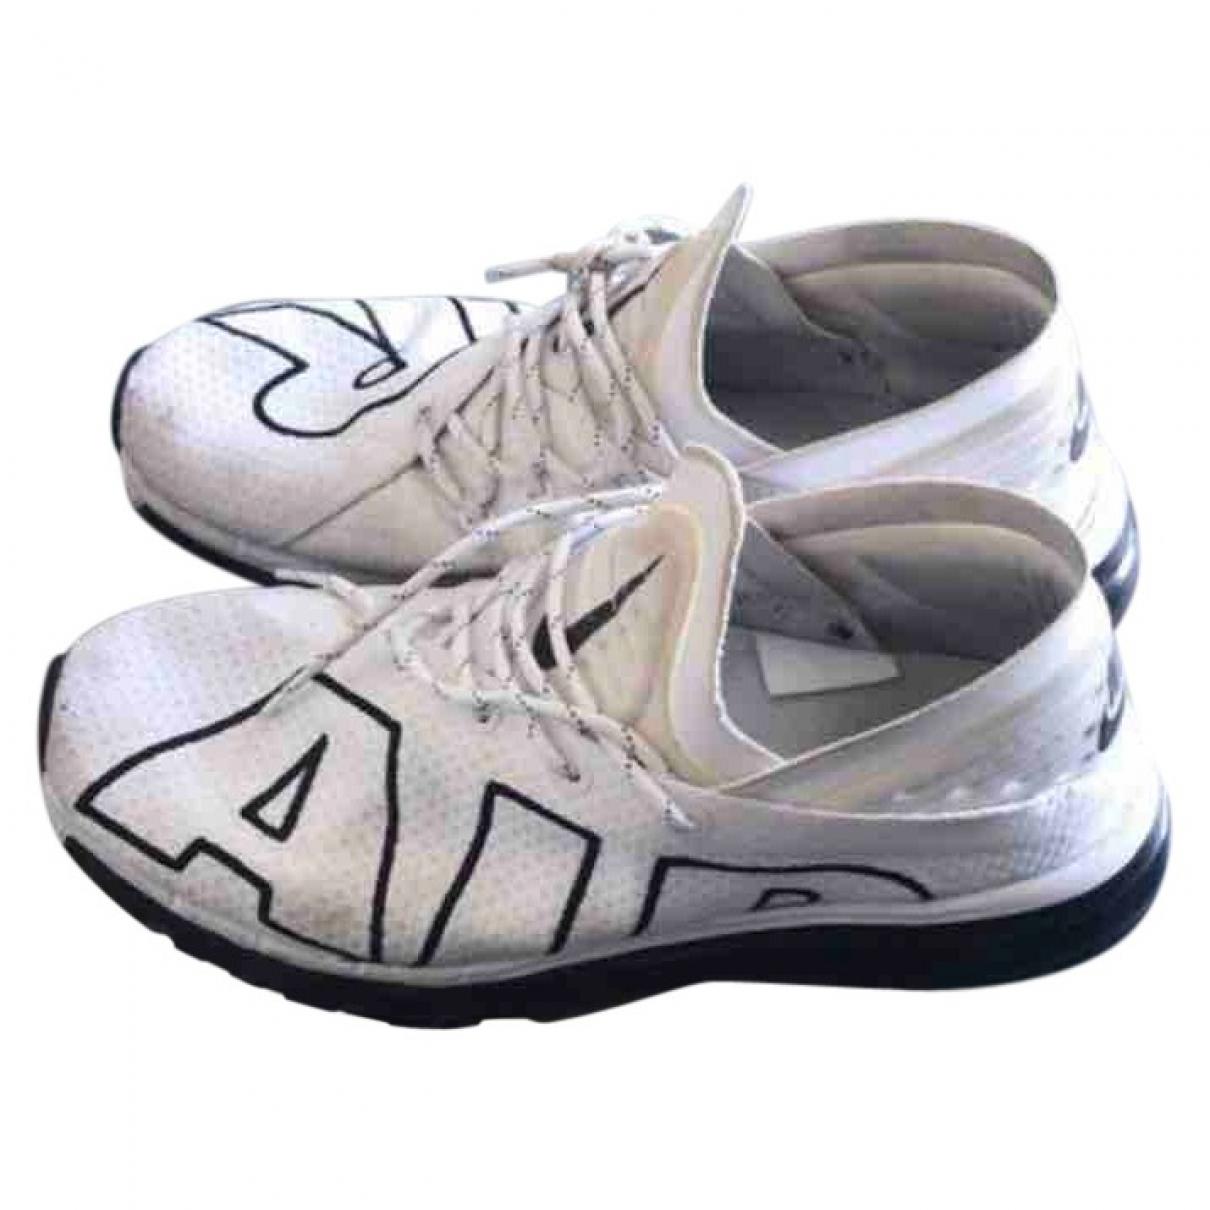 Nike Air Max  White Cloth Trainers for Men 43 EU